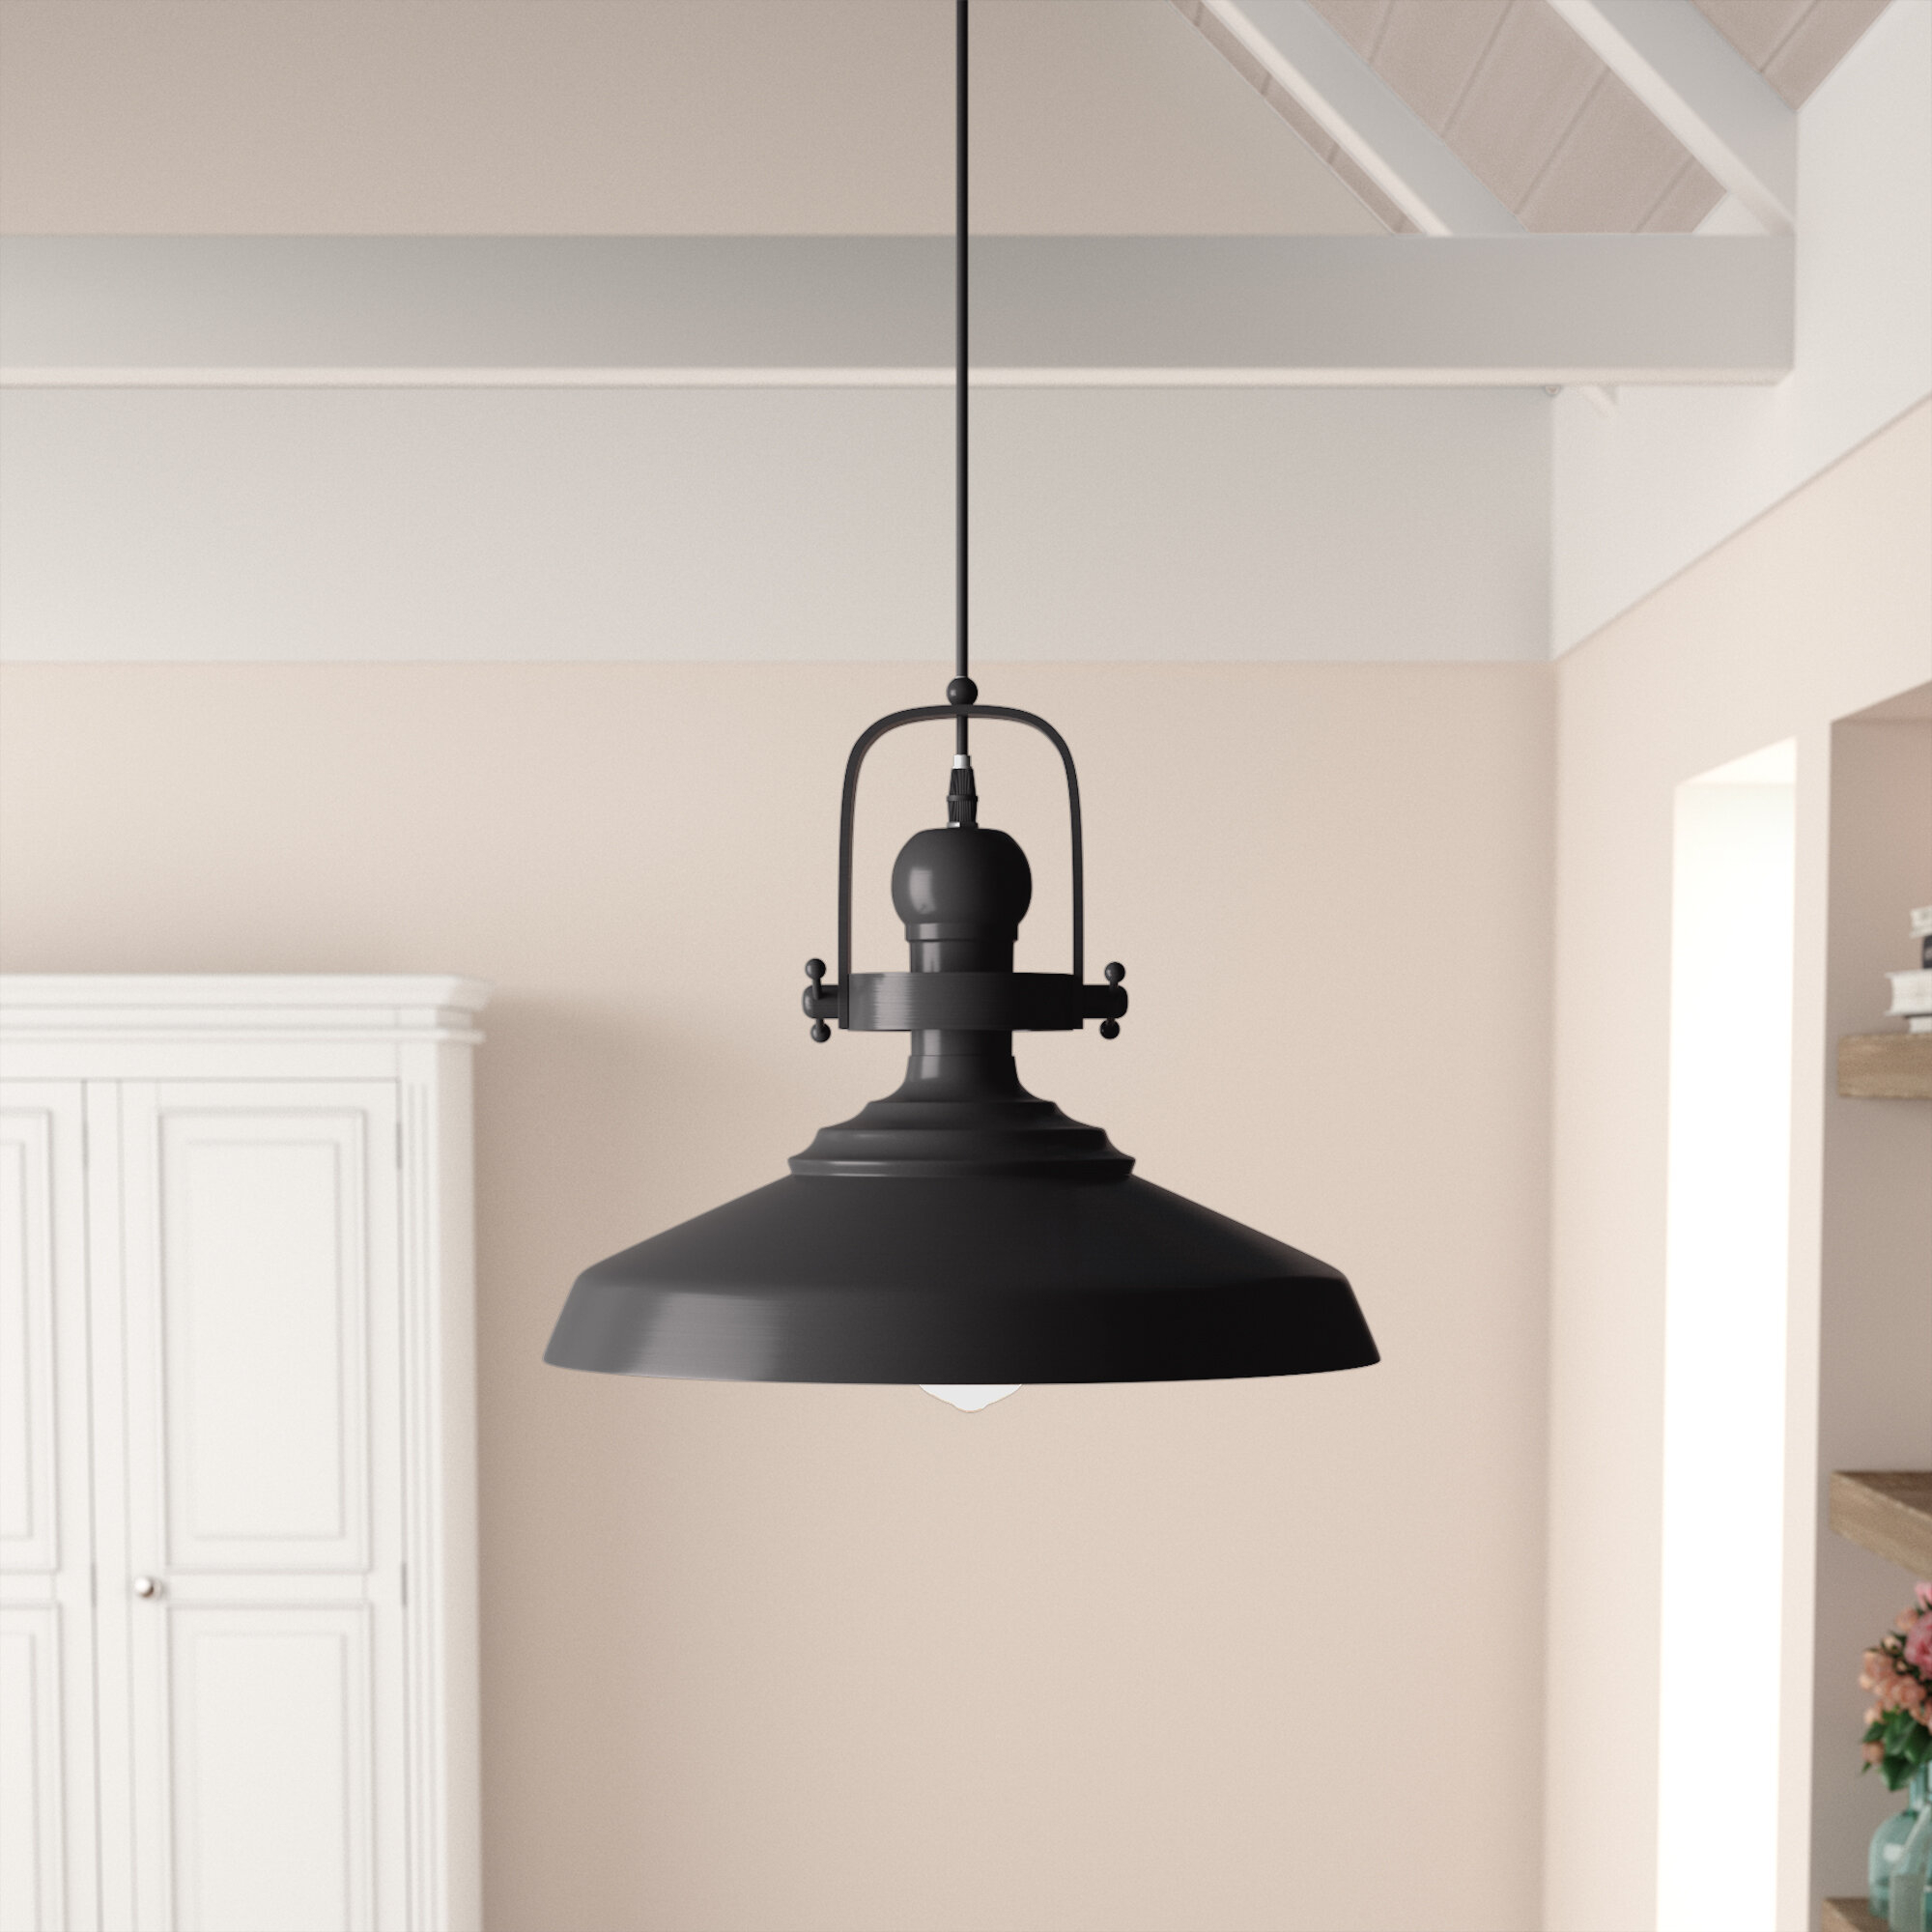 Estelle 1 Light Single Dome Pendant With Priston 1 Light Single Dome Pendants (Gallery 8 of 30)